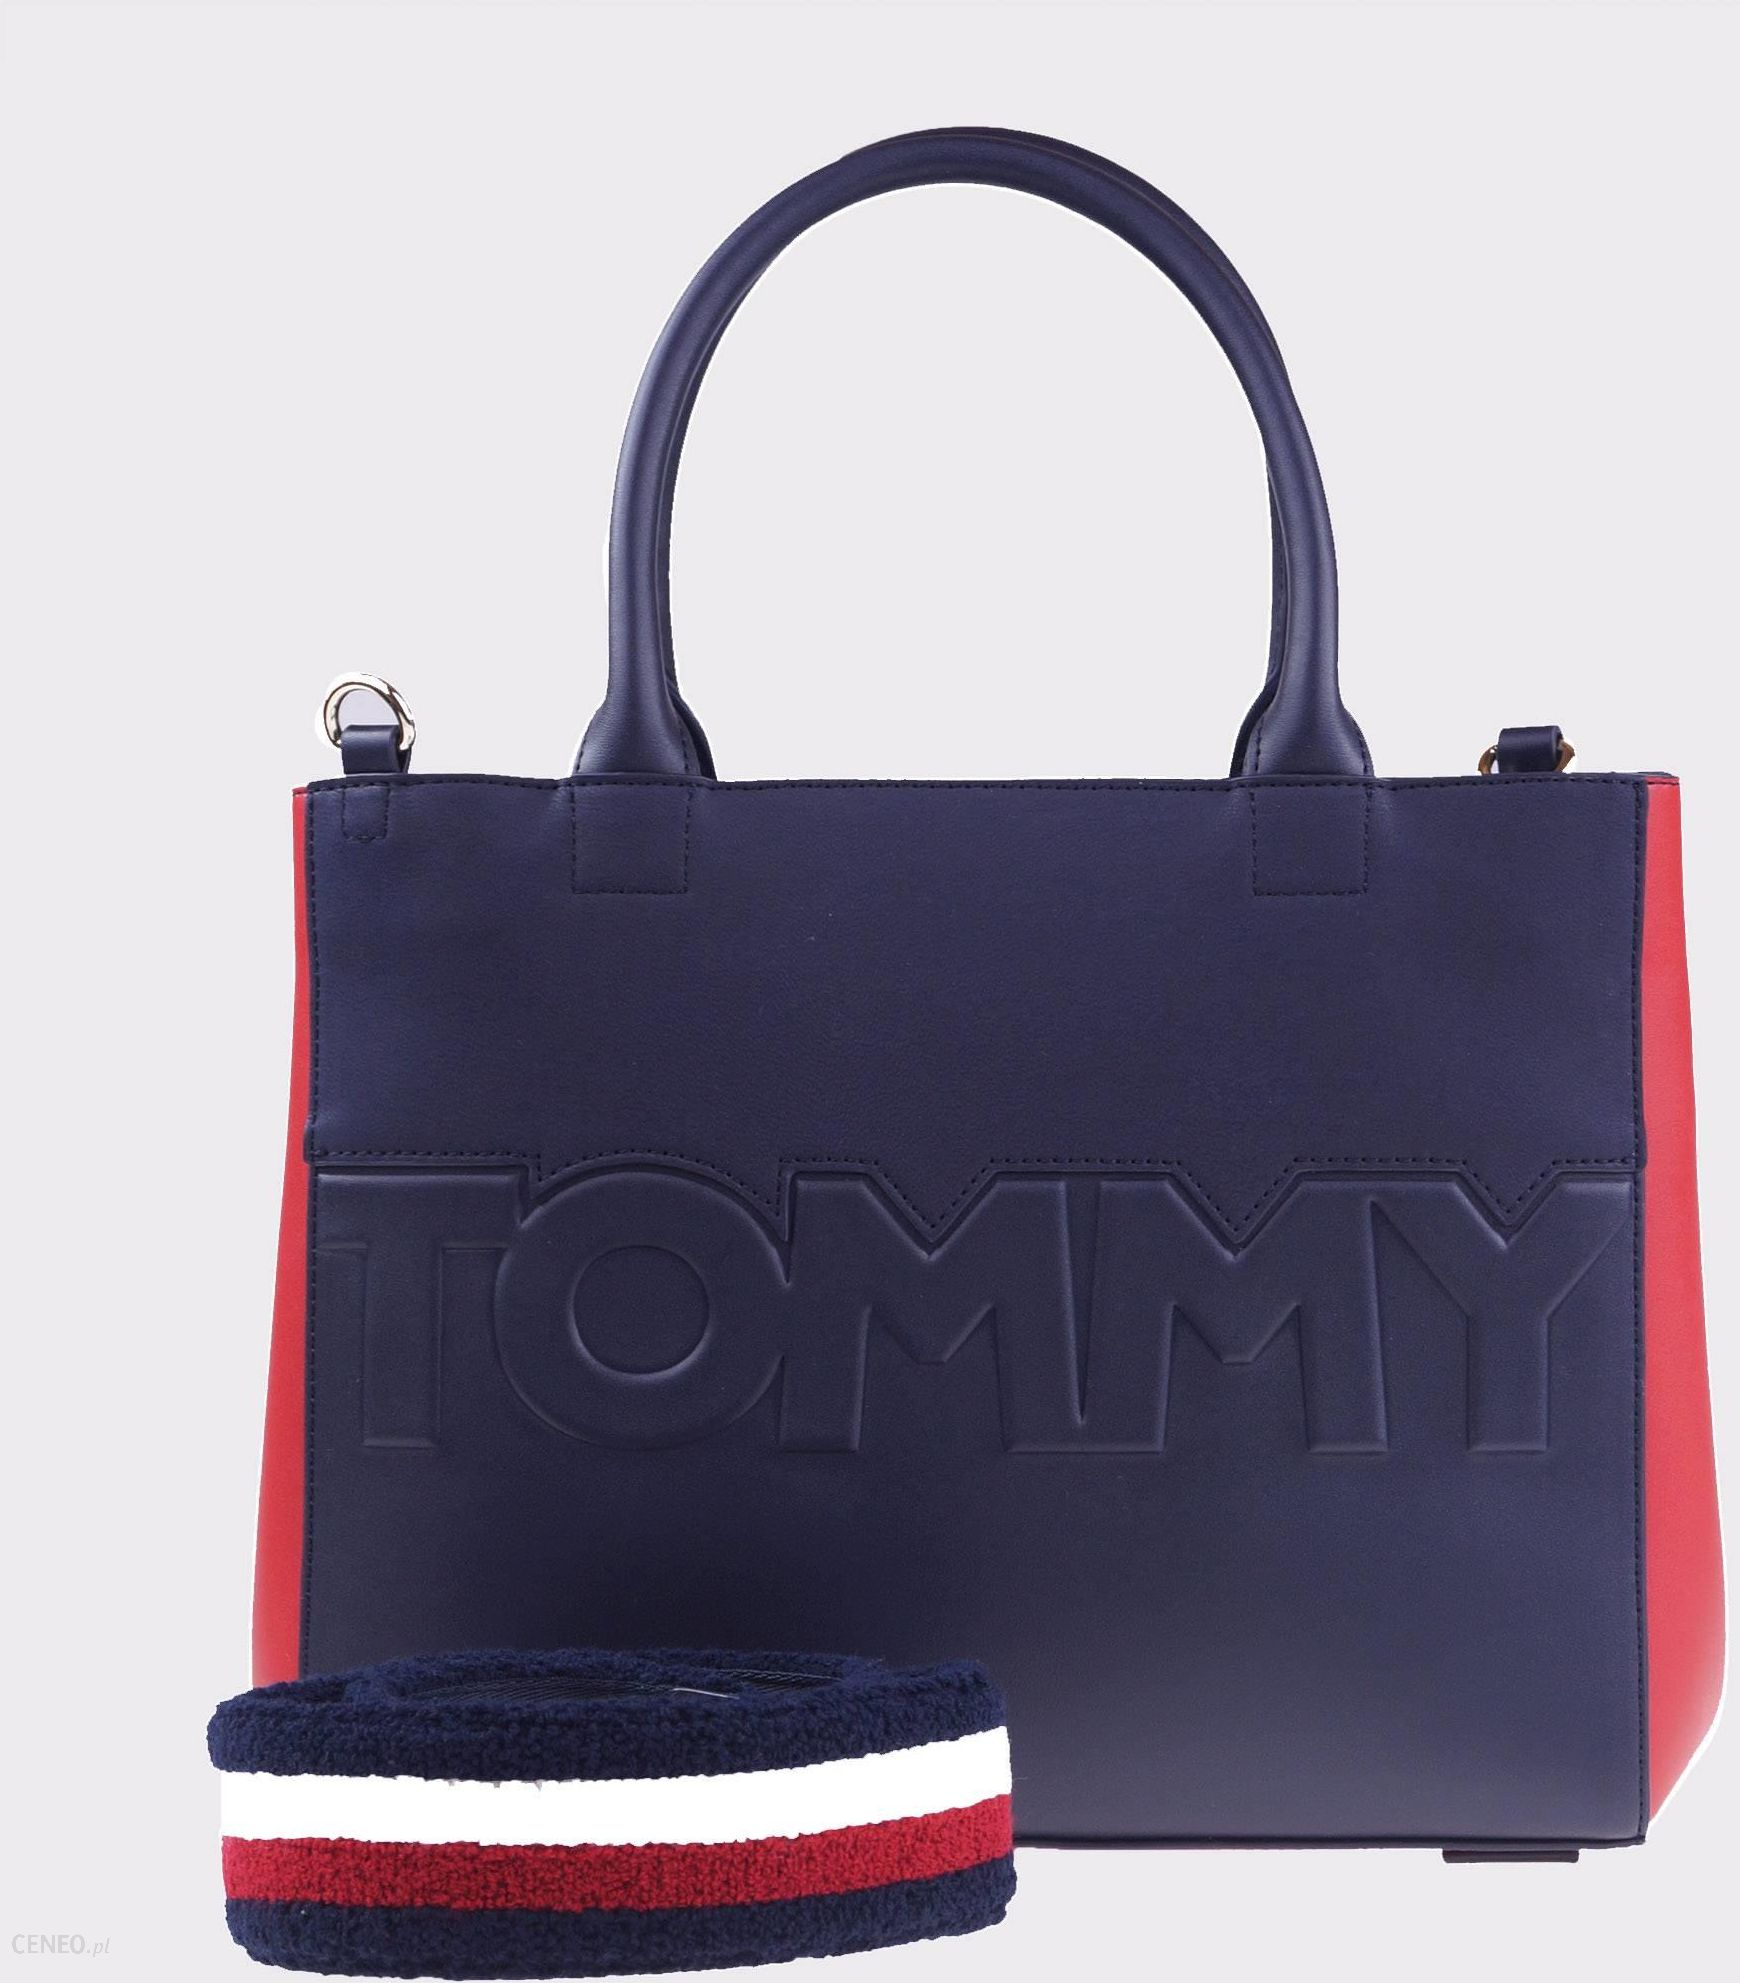 887d230a4d47a Torebka Tommy Hilfiger Logo - Ceny i opinie - Ceneo.pl